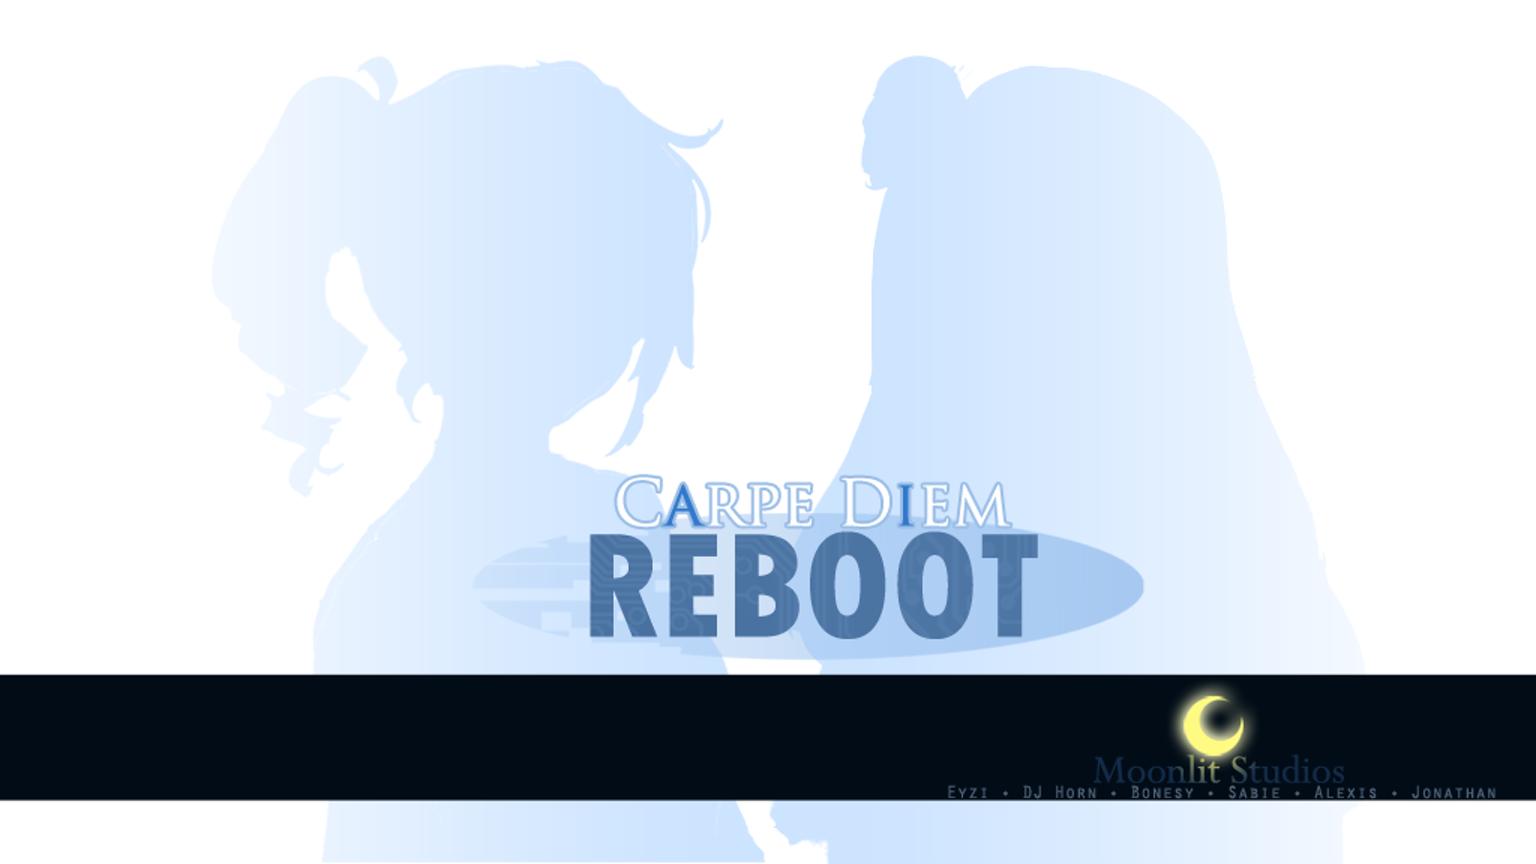 Carpe Diem Reboot Carpe Diem Reboot Visual Novel